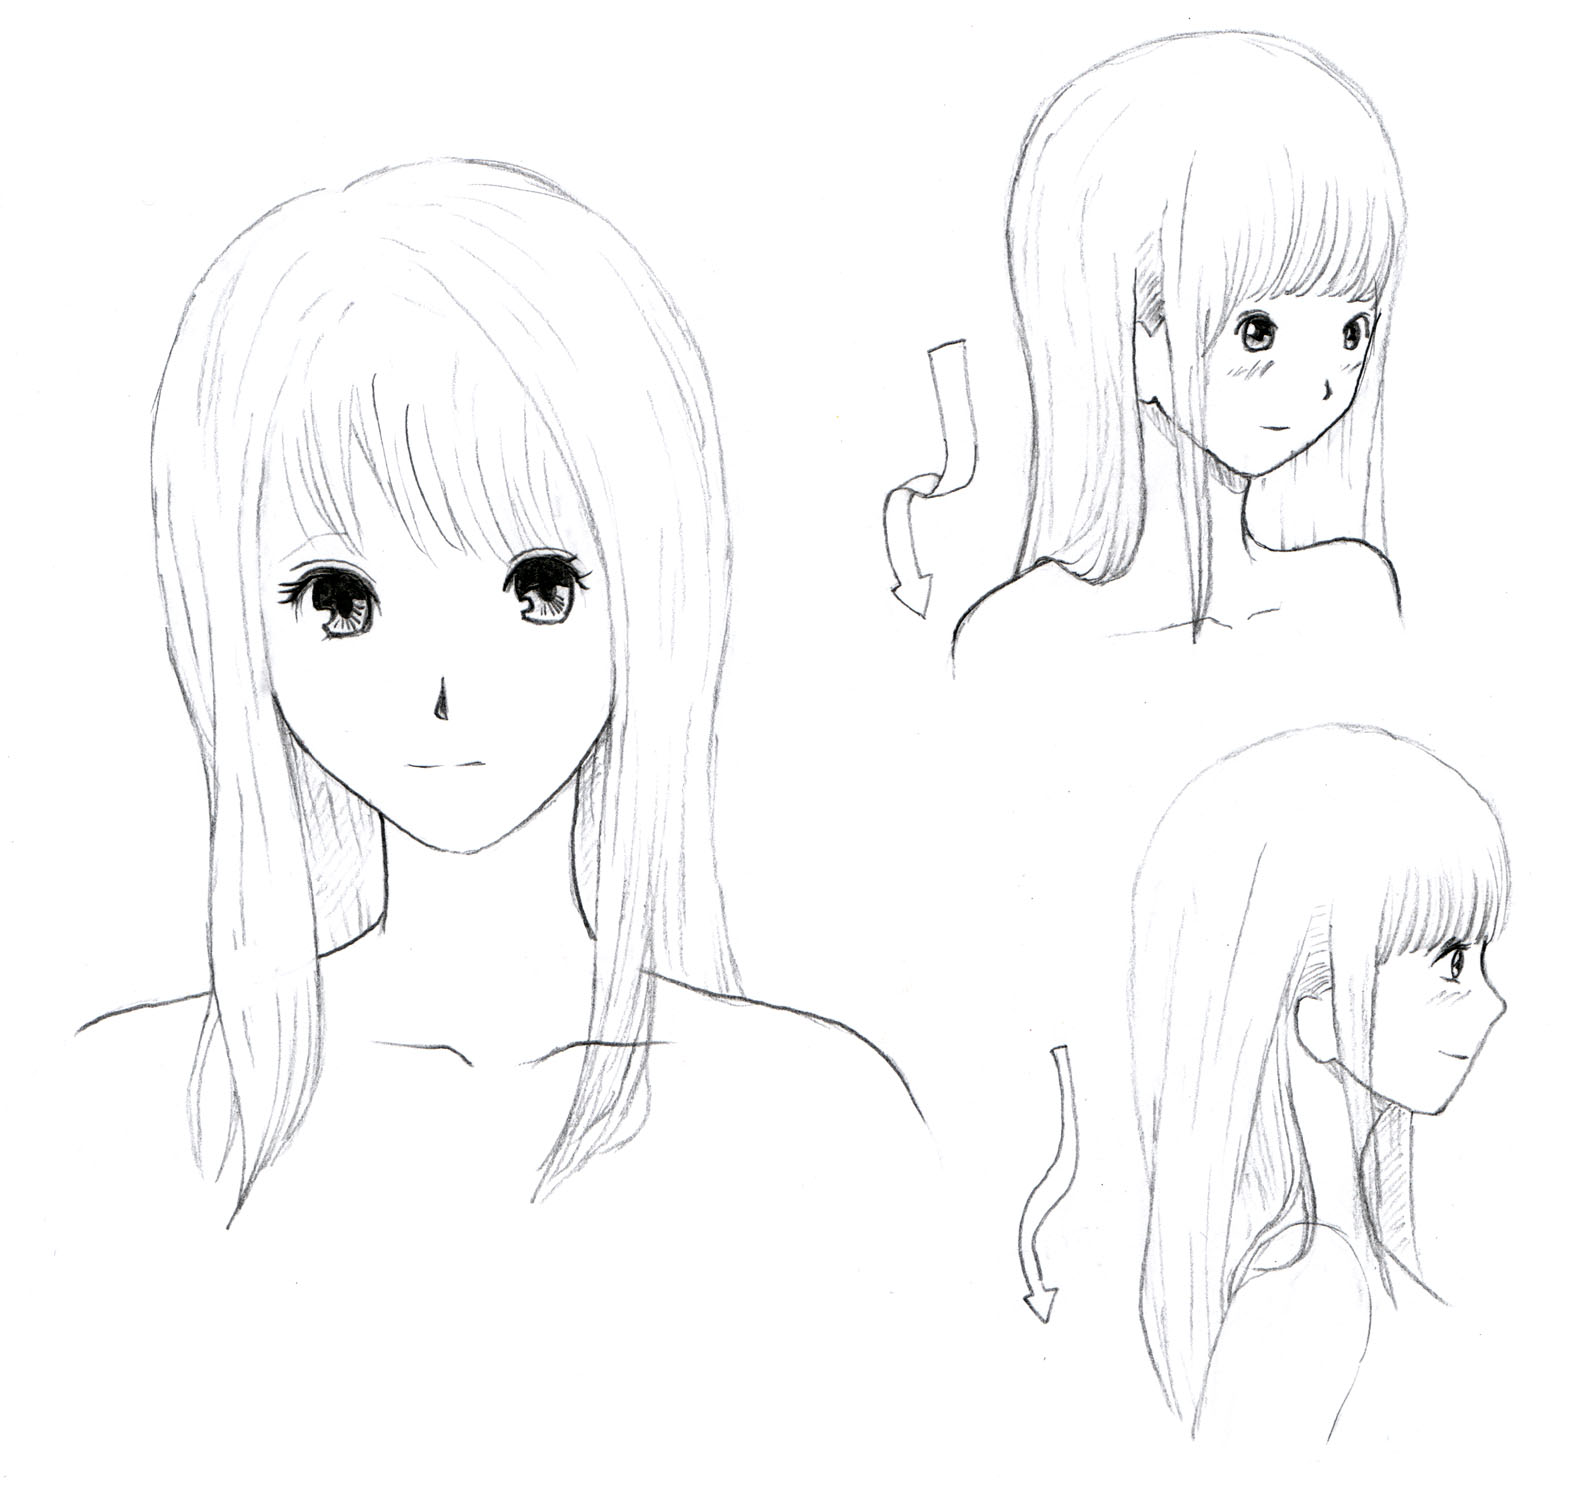 JohnnyBro's How To Draw Manga: How To Draw Manga Hair